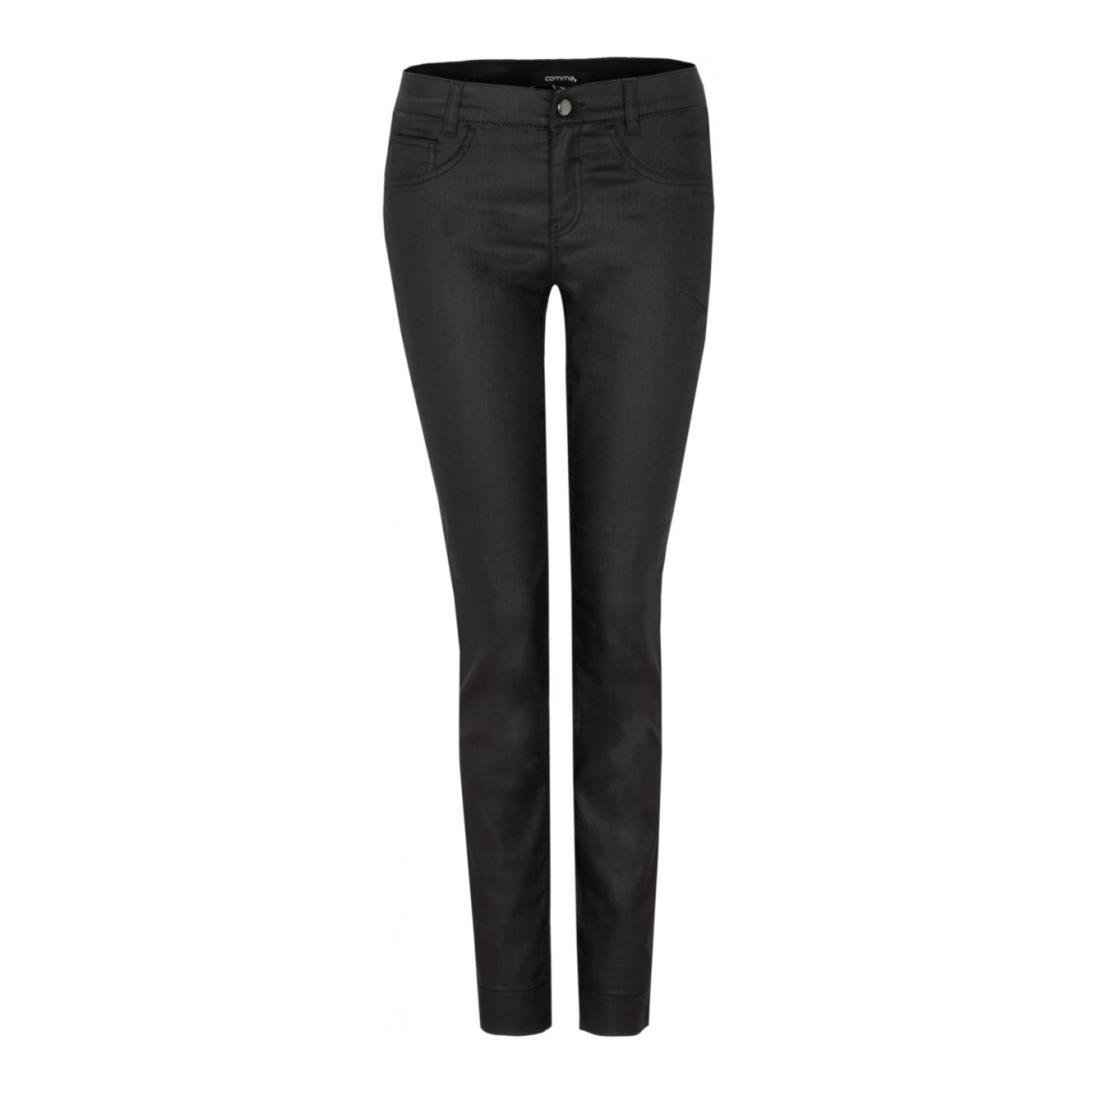 Comma Bermuda/Shorts Damen Hose 7/8